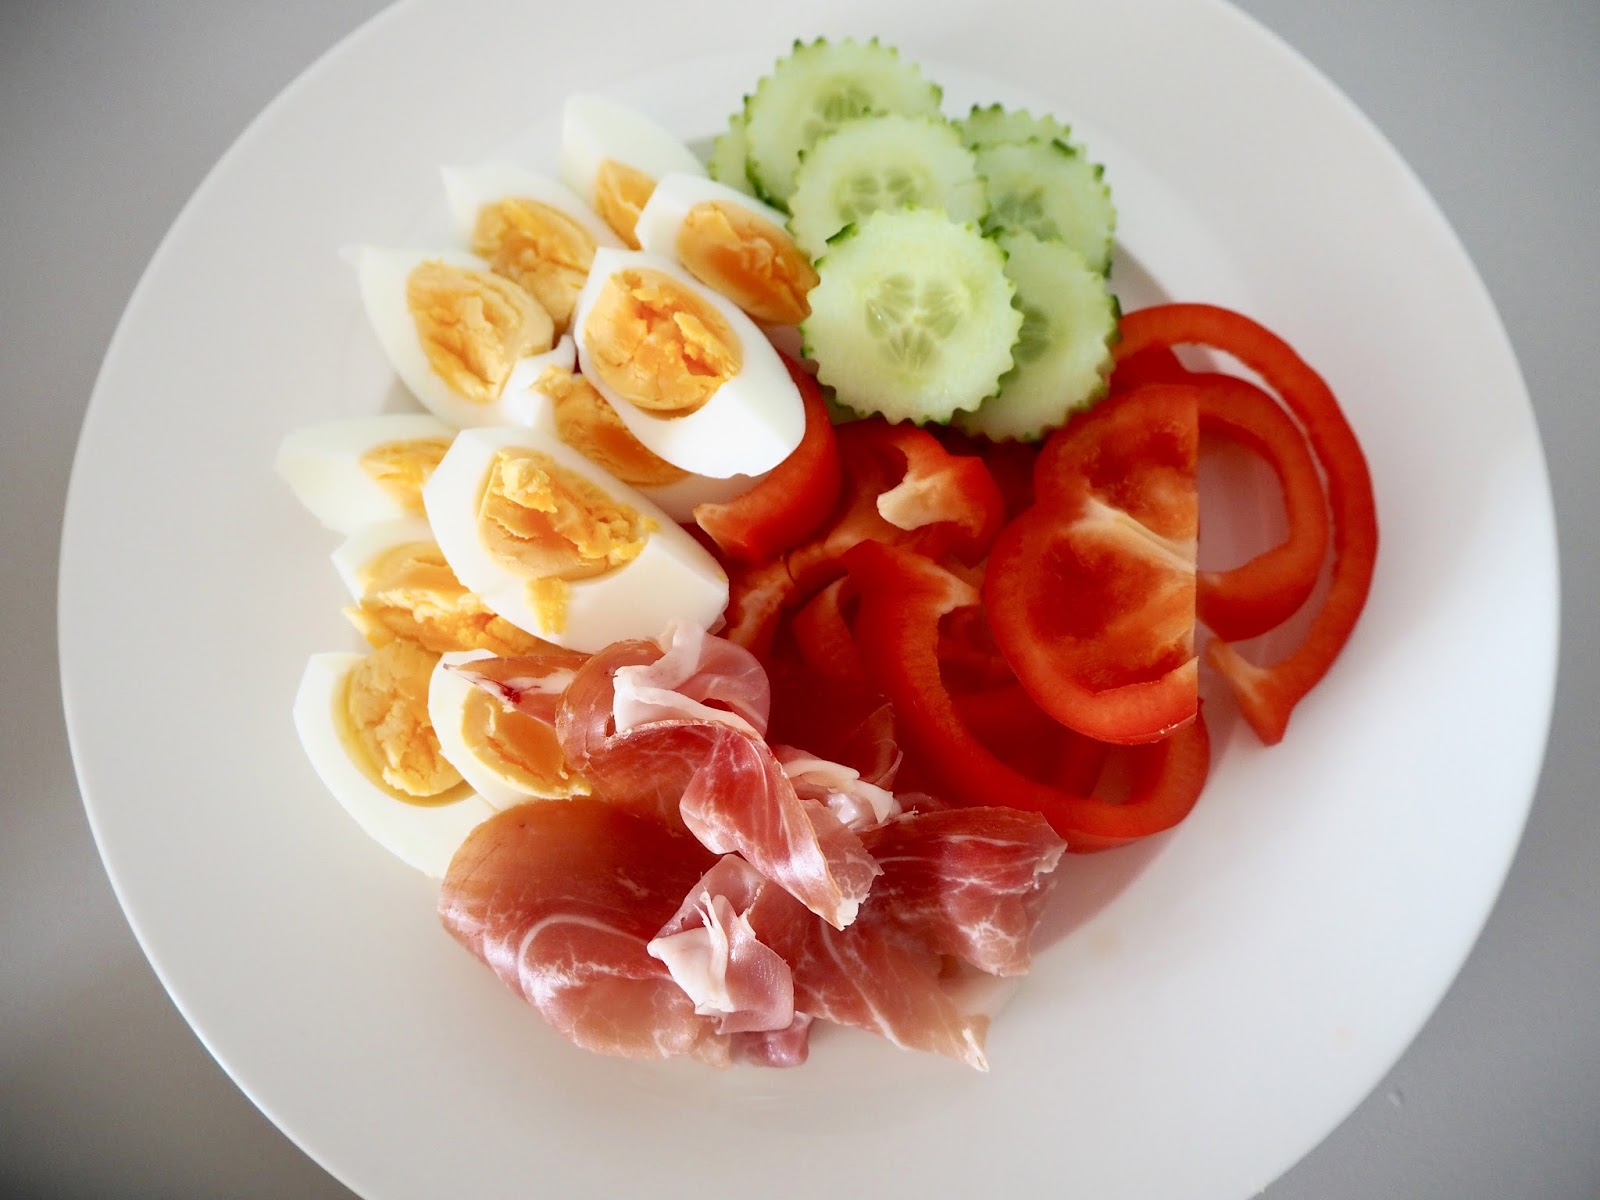 FOOD DIARY 10